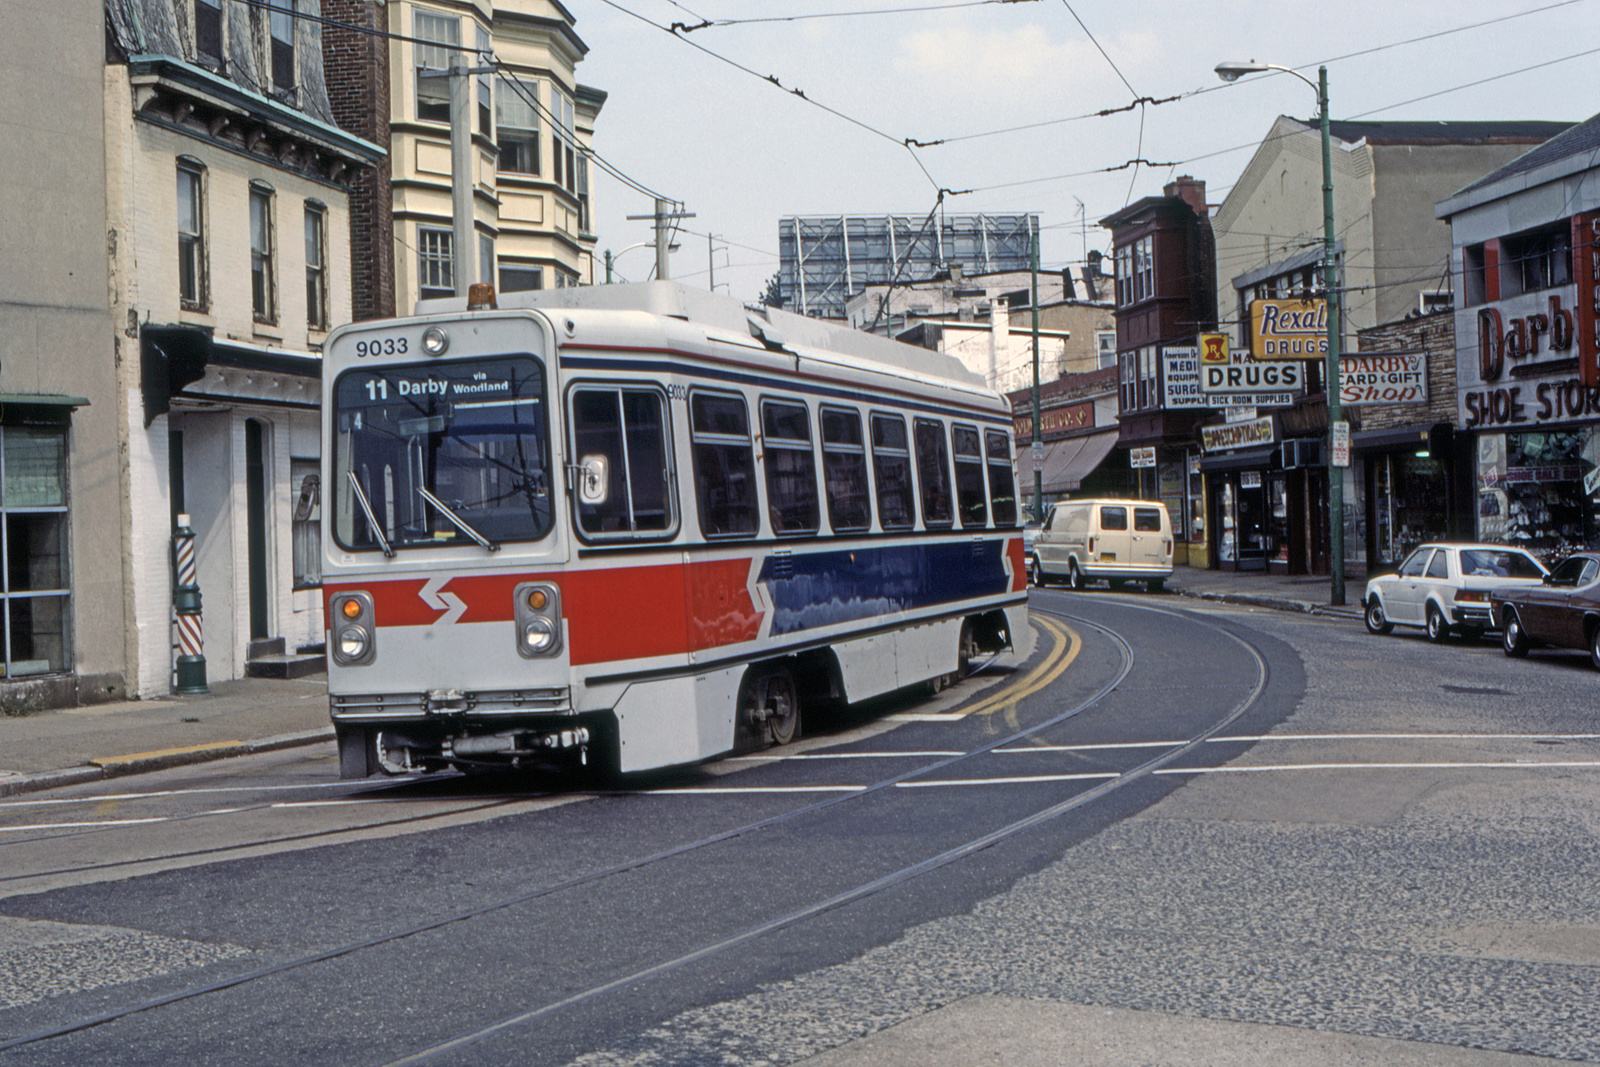 (904k, 1600x1067)<br><b>Country:</b> United States<br><b>City:</b> Philadelphia, PA<br><b>System:</b> SEPTA (or Predecessor)<br><b>Line:</b> Rt. 11-Darby<br><b>Location:</b> Main/9th (Darby)<br><b>Car:</b> SEPTA K Single-ended (Kawasaki, 1981) 9033 <br><b>Collection of:</b> David Pirmann<br><b>Date:</b> 7/20/1993<br><b>Viewed (this week/total):</b> 0 / 100